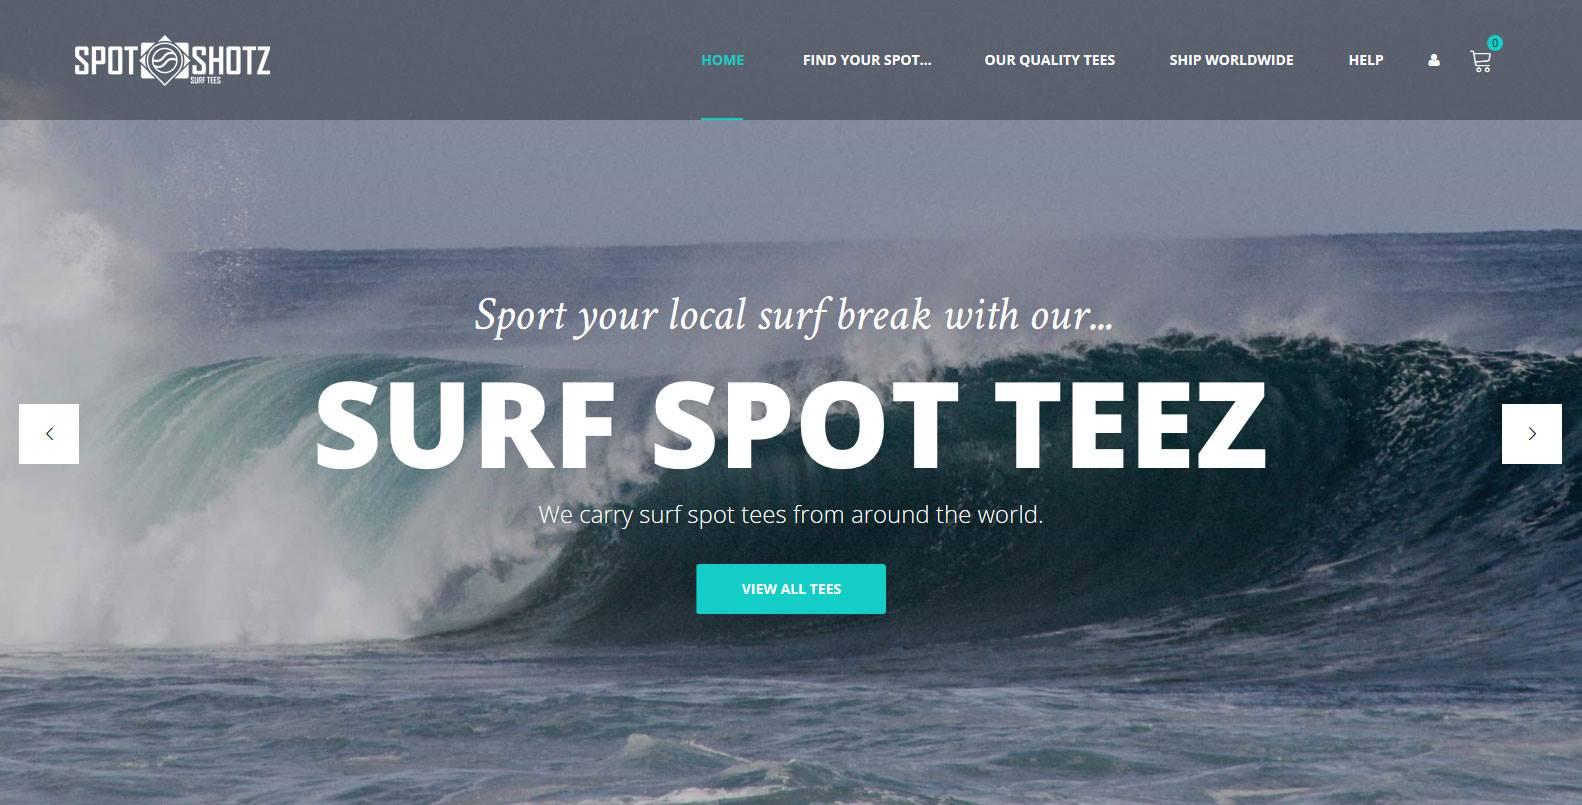 website-design-services-oc47.jpg